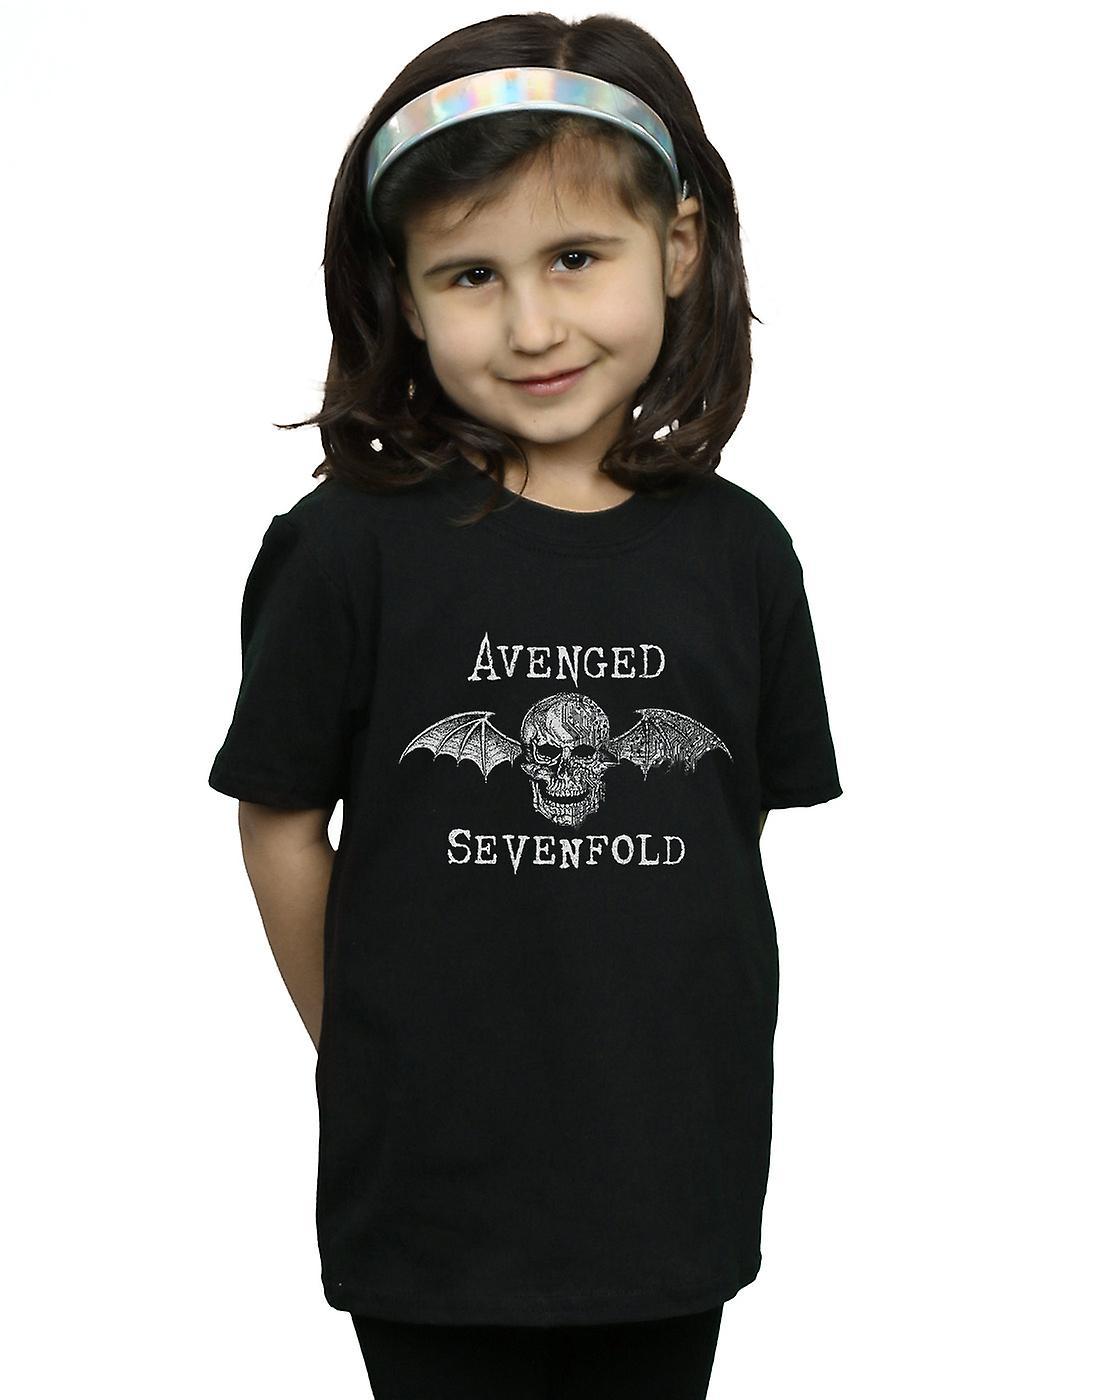 Avenged Sevenfold Girls Cyborg Deathbat T-Shirt